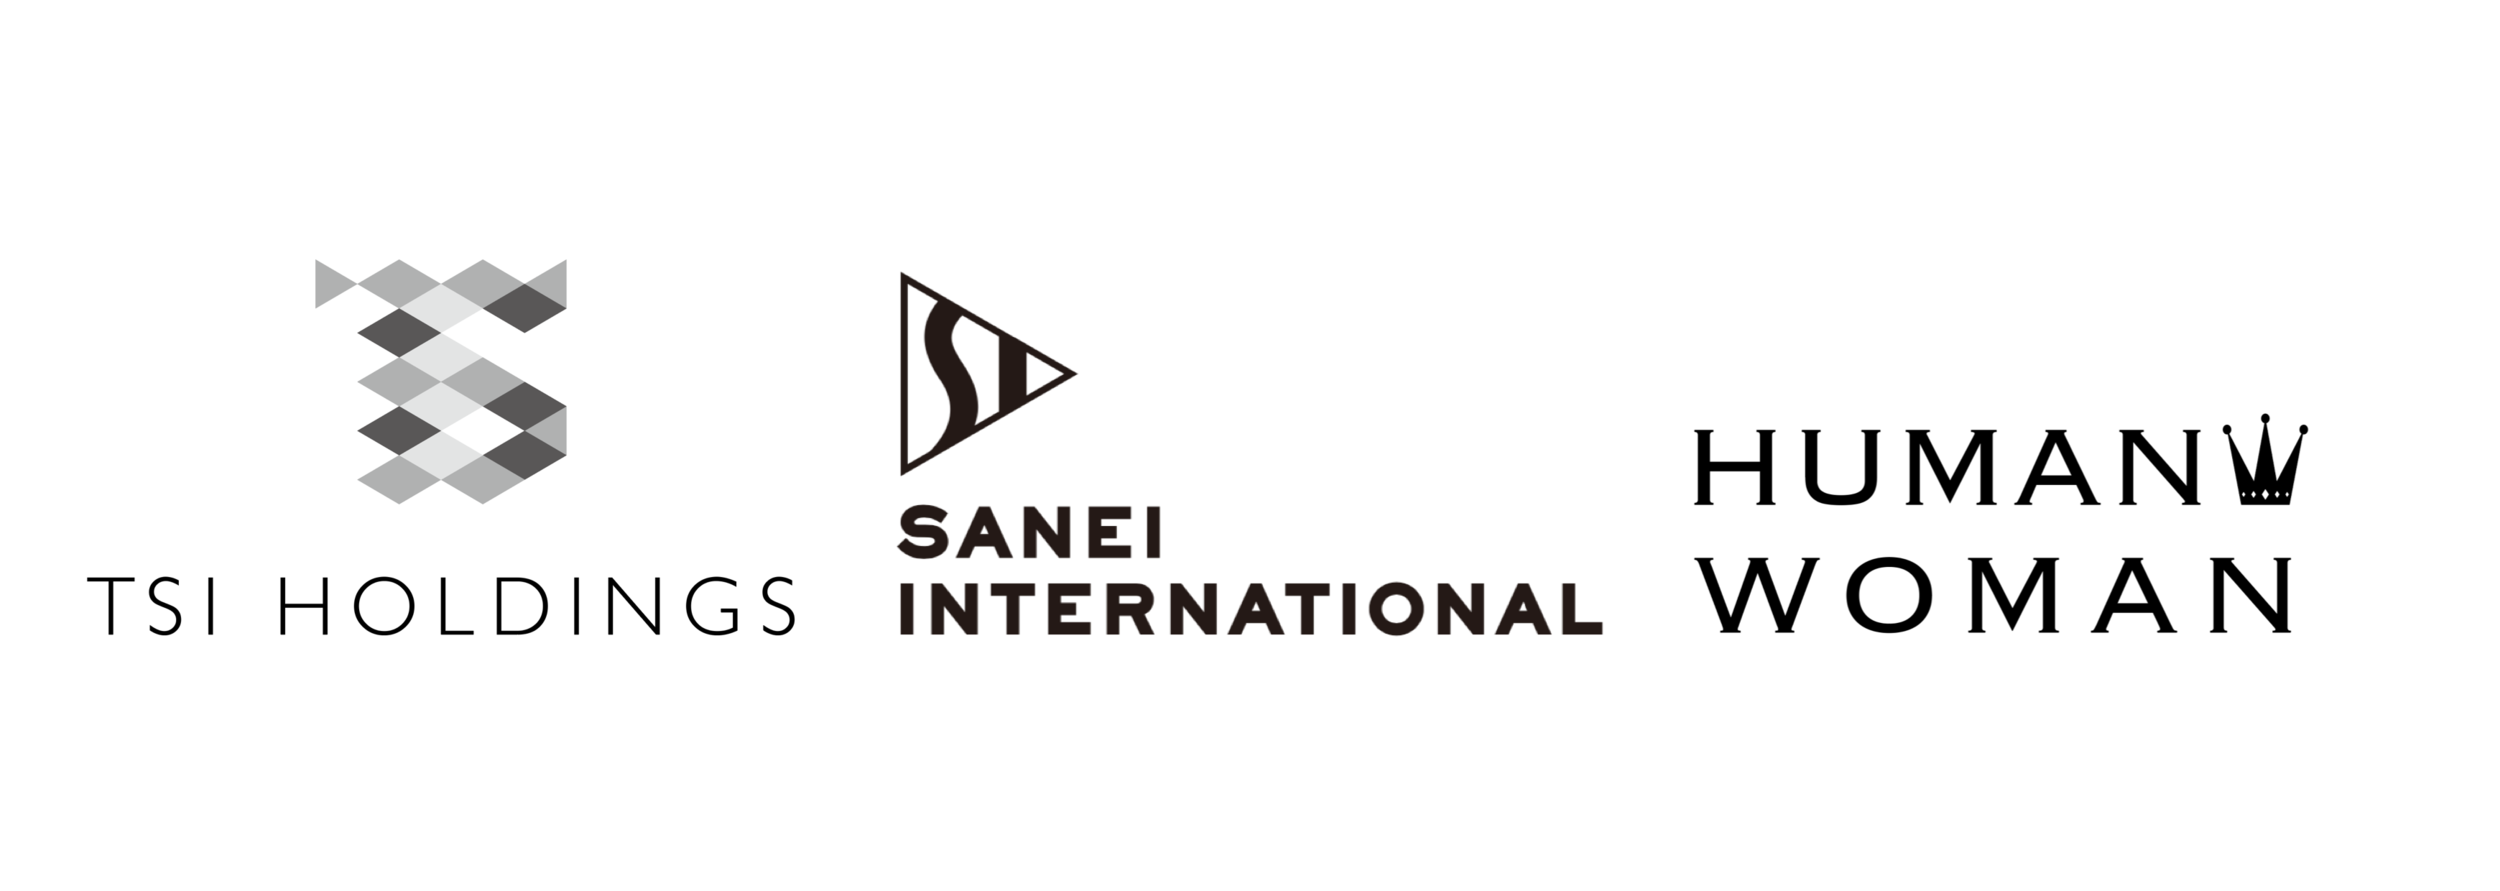 3 Company Logo Banner .png